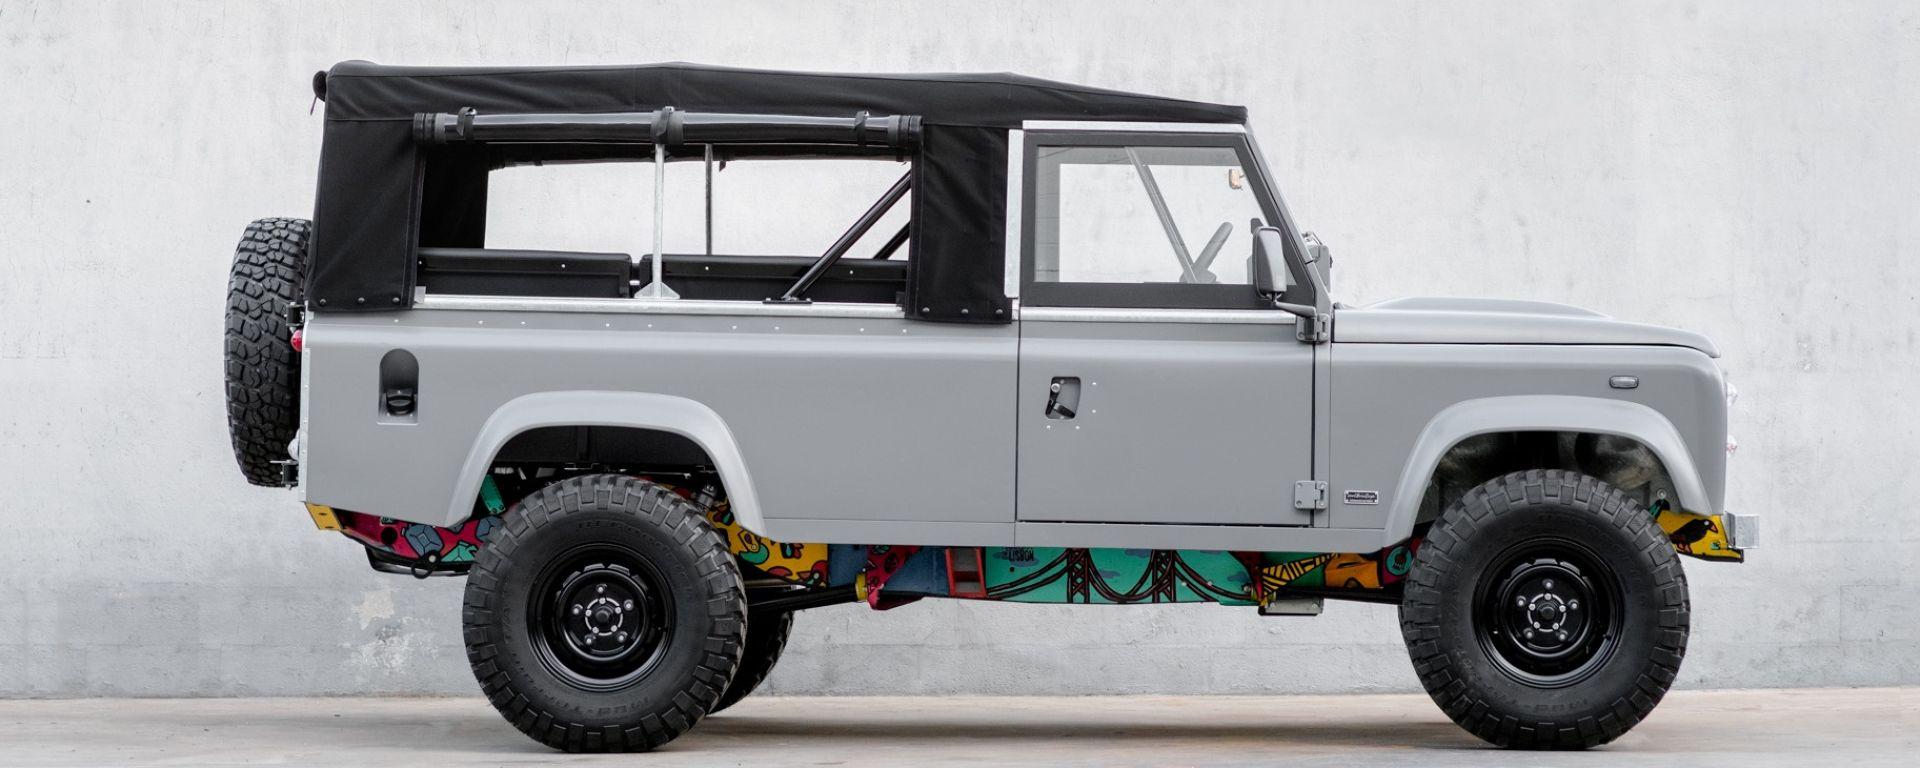 Land Rover Defender Art 110: opera d'arte sotto copertura